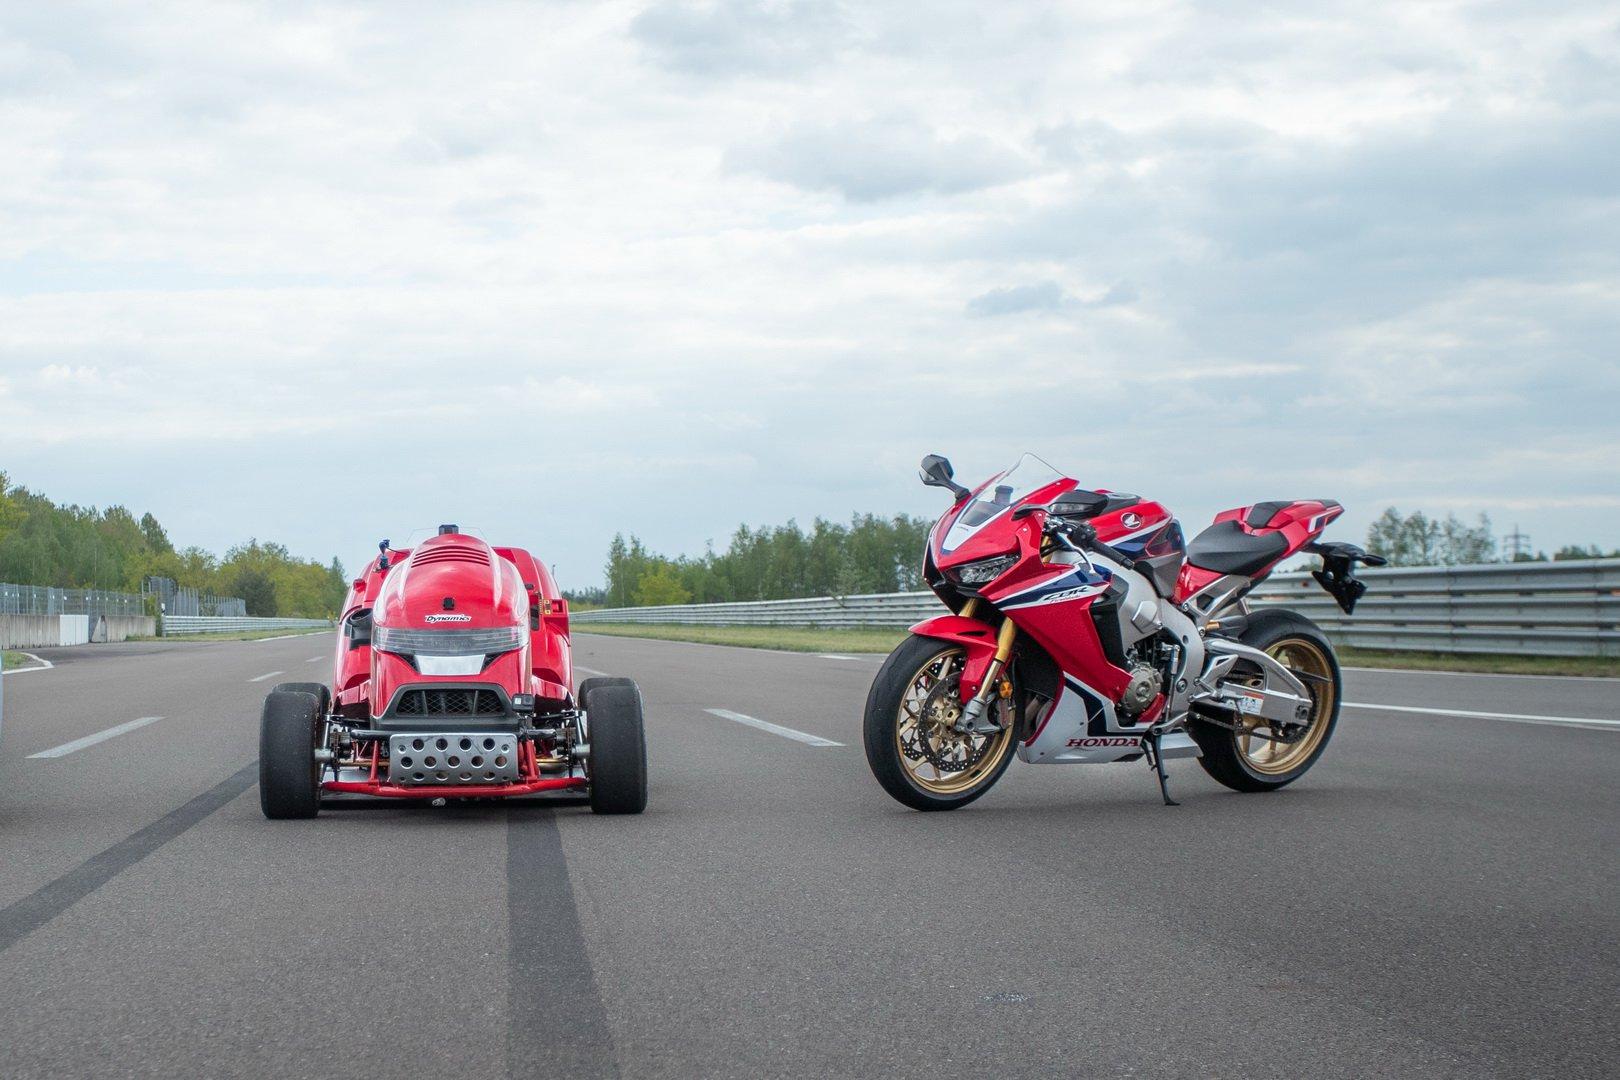 Газонокосилка Honda Mean Mower V2 ставит рекорды скорости_2